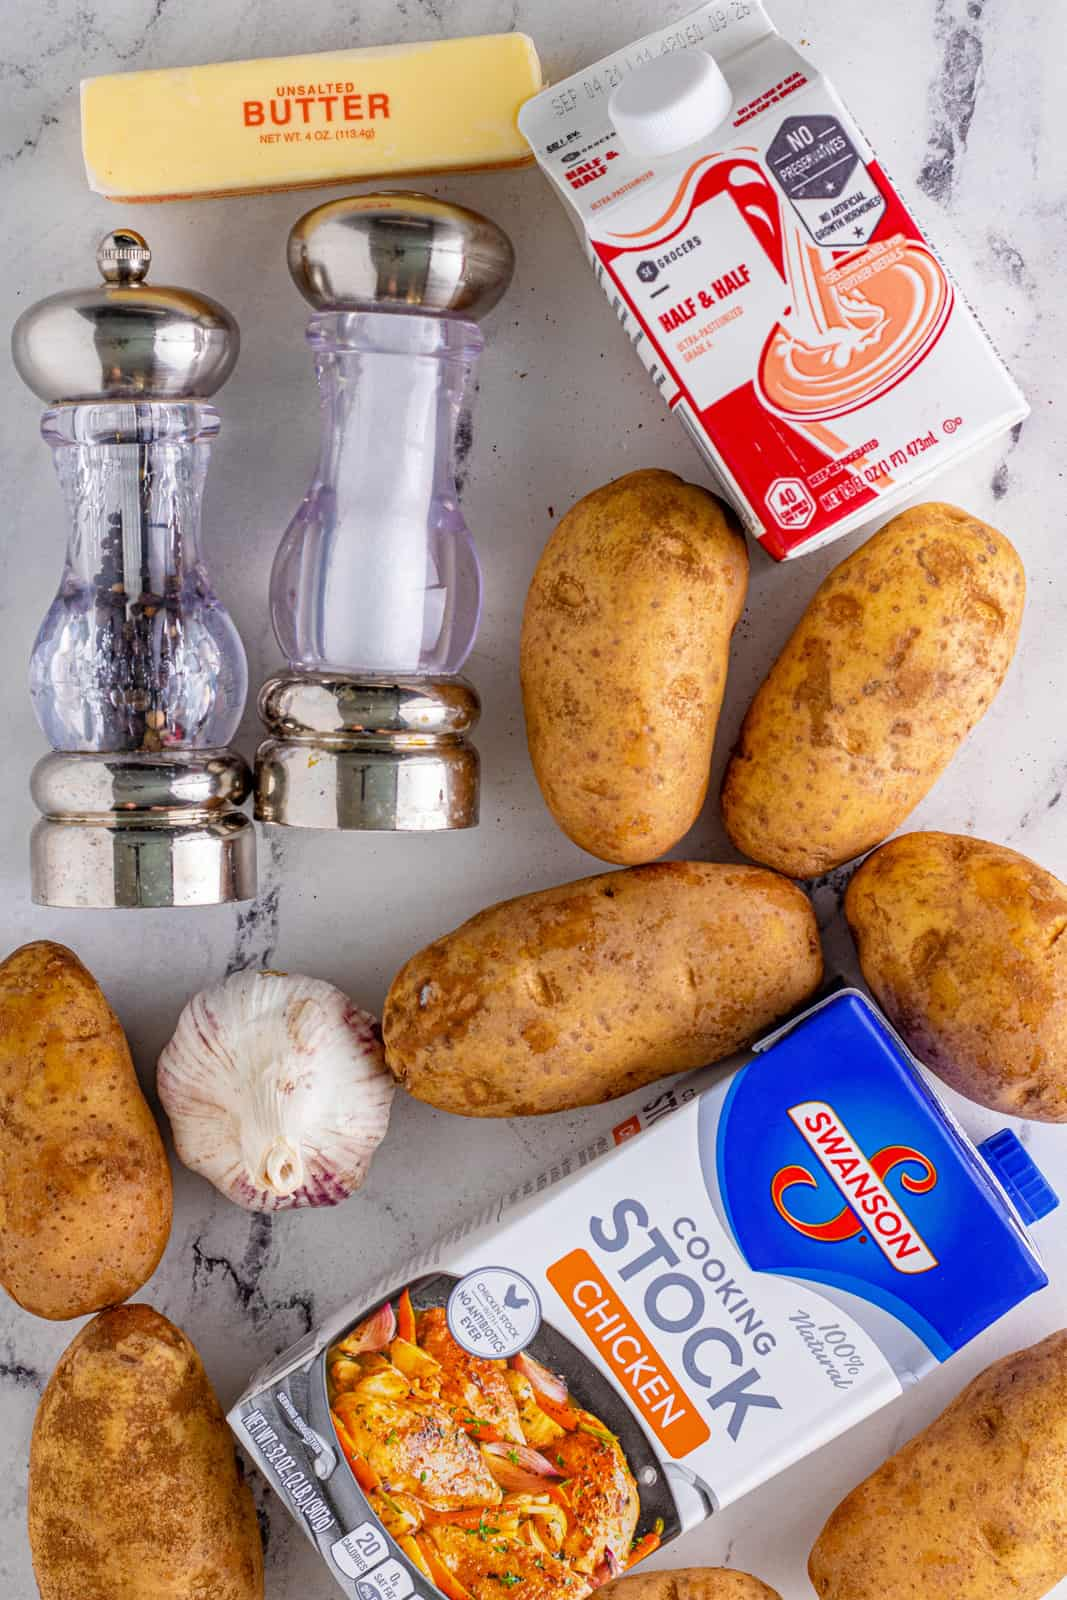 Ingredients needed to make Crockpot Mashed Potatoes